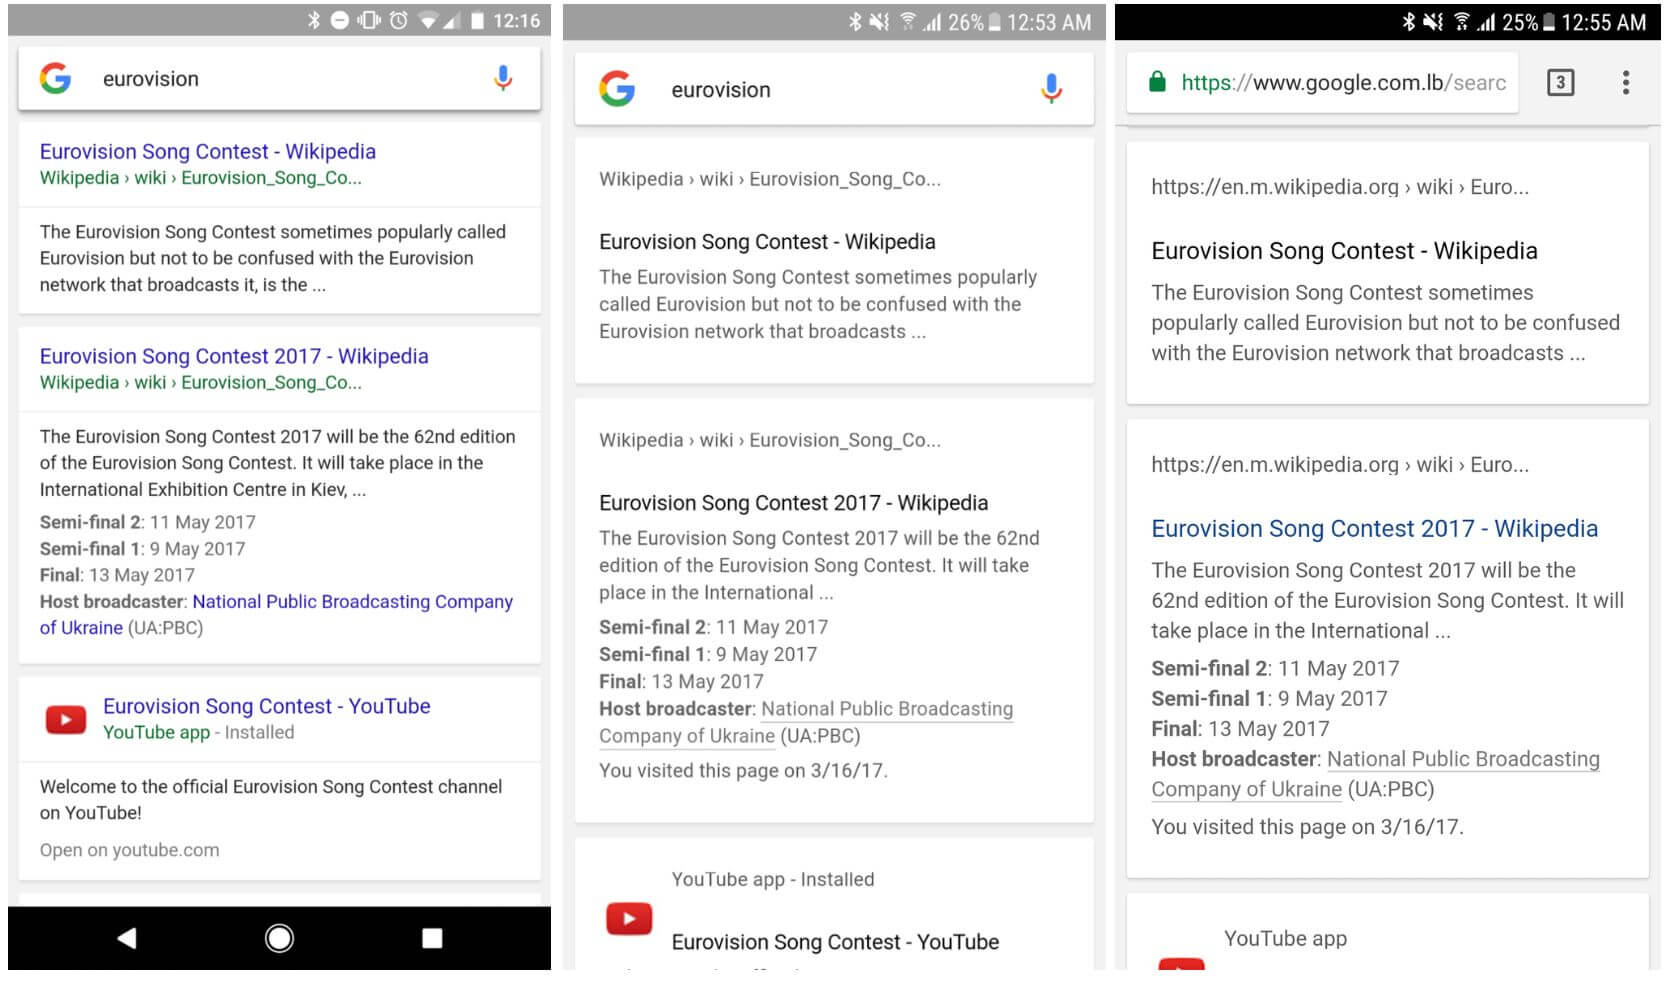 google search design test